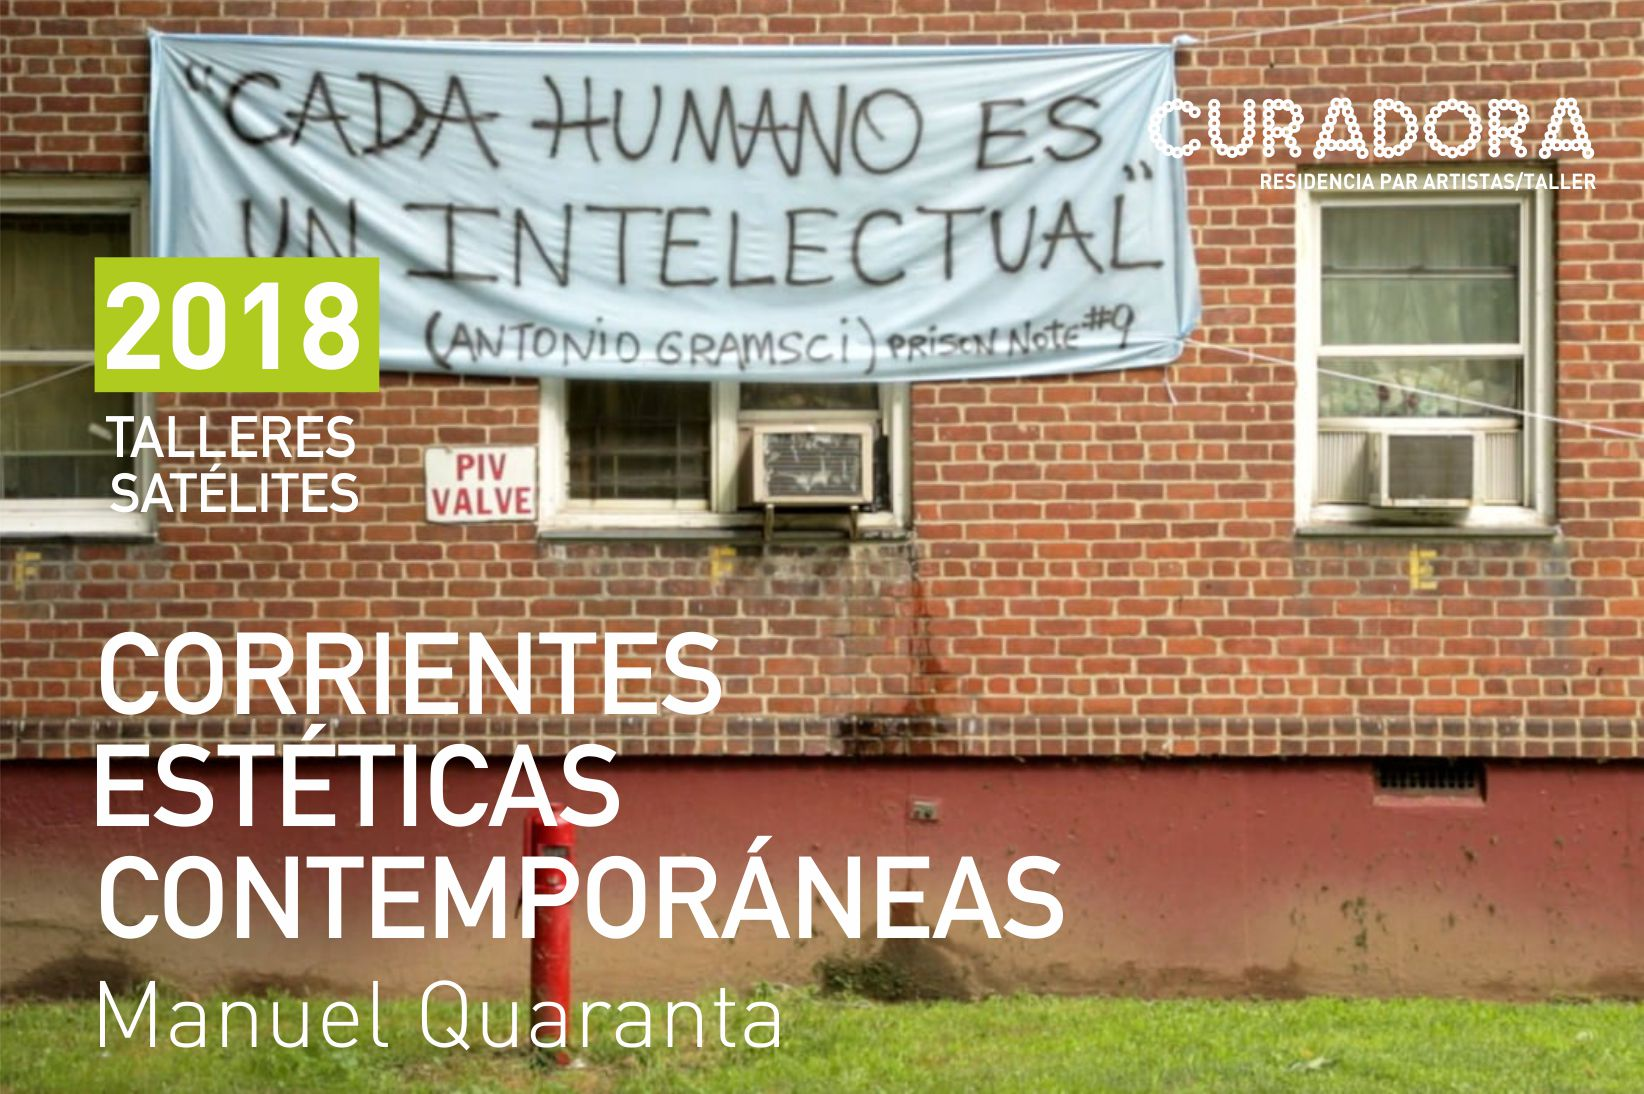 2018 / Talleres Satélites: Quaranta